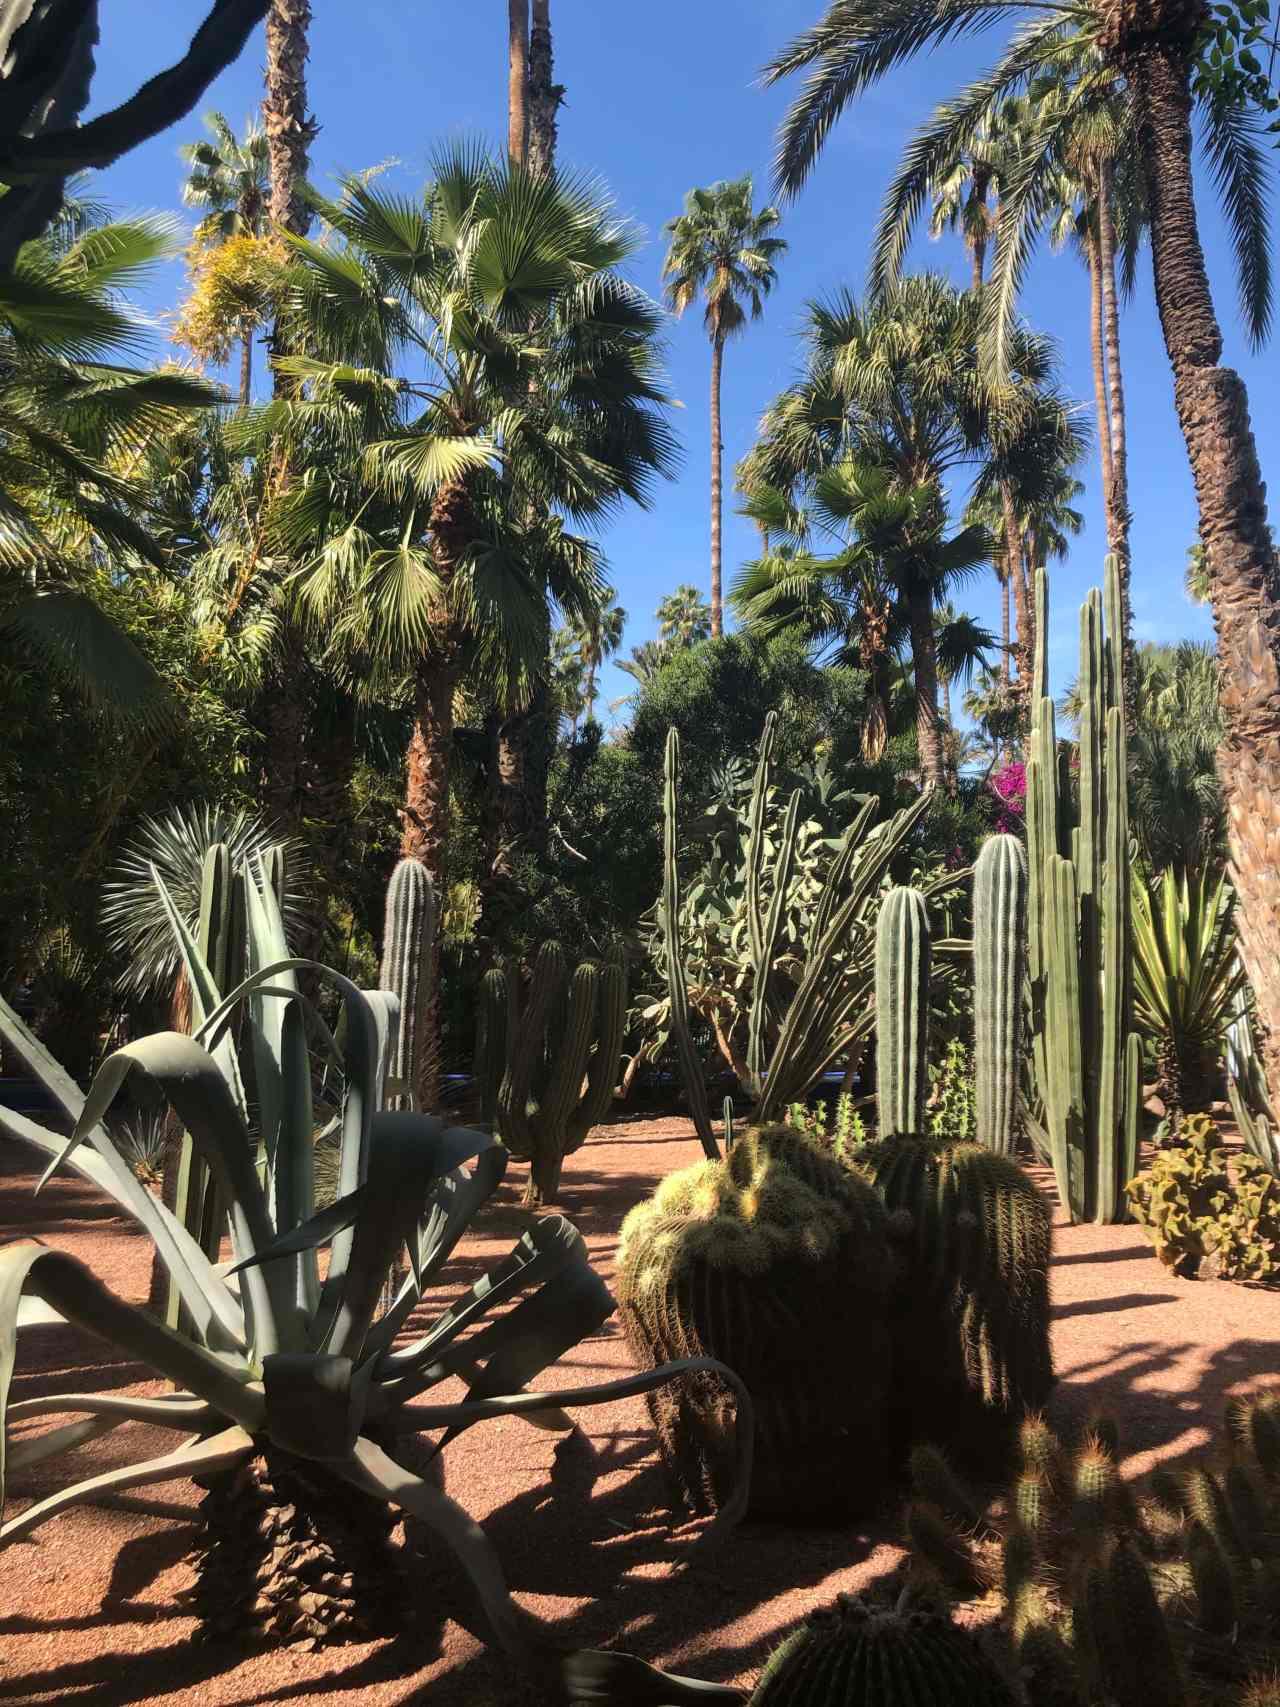 Multiple cacti at Le Jardin majorelle